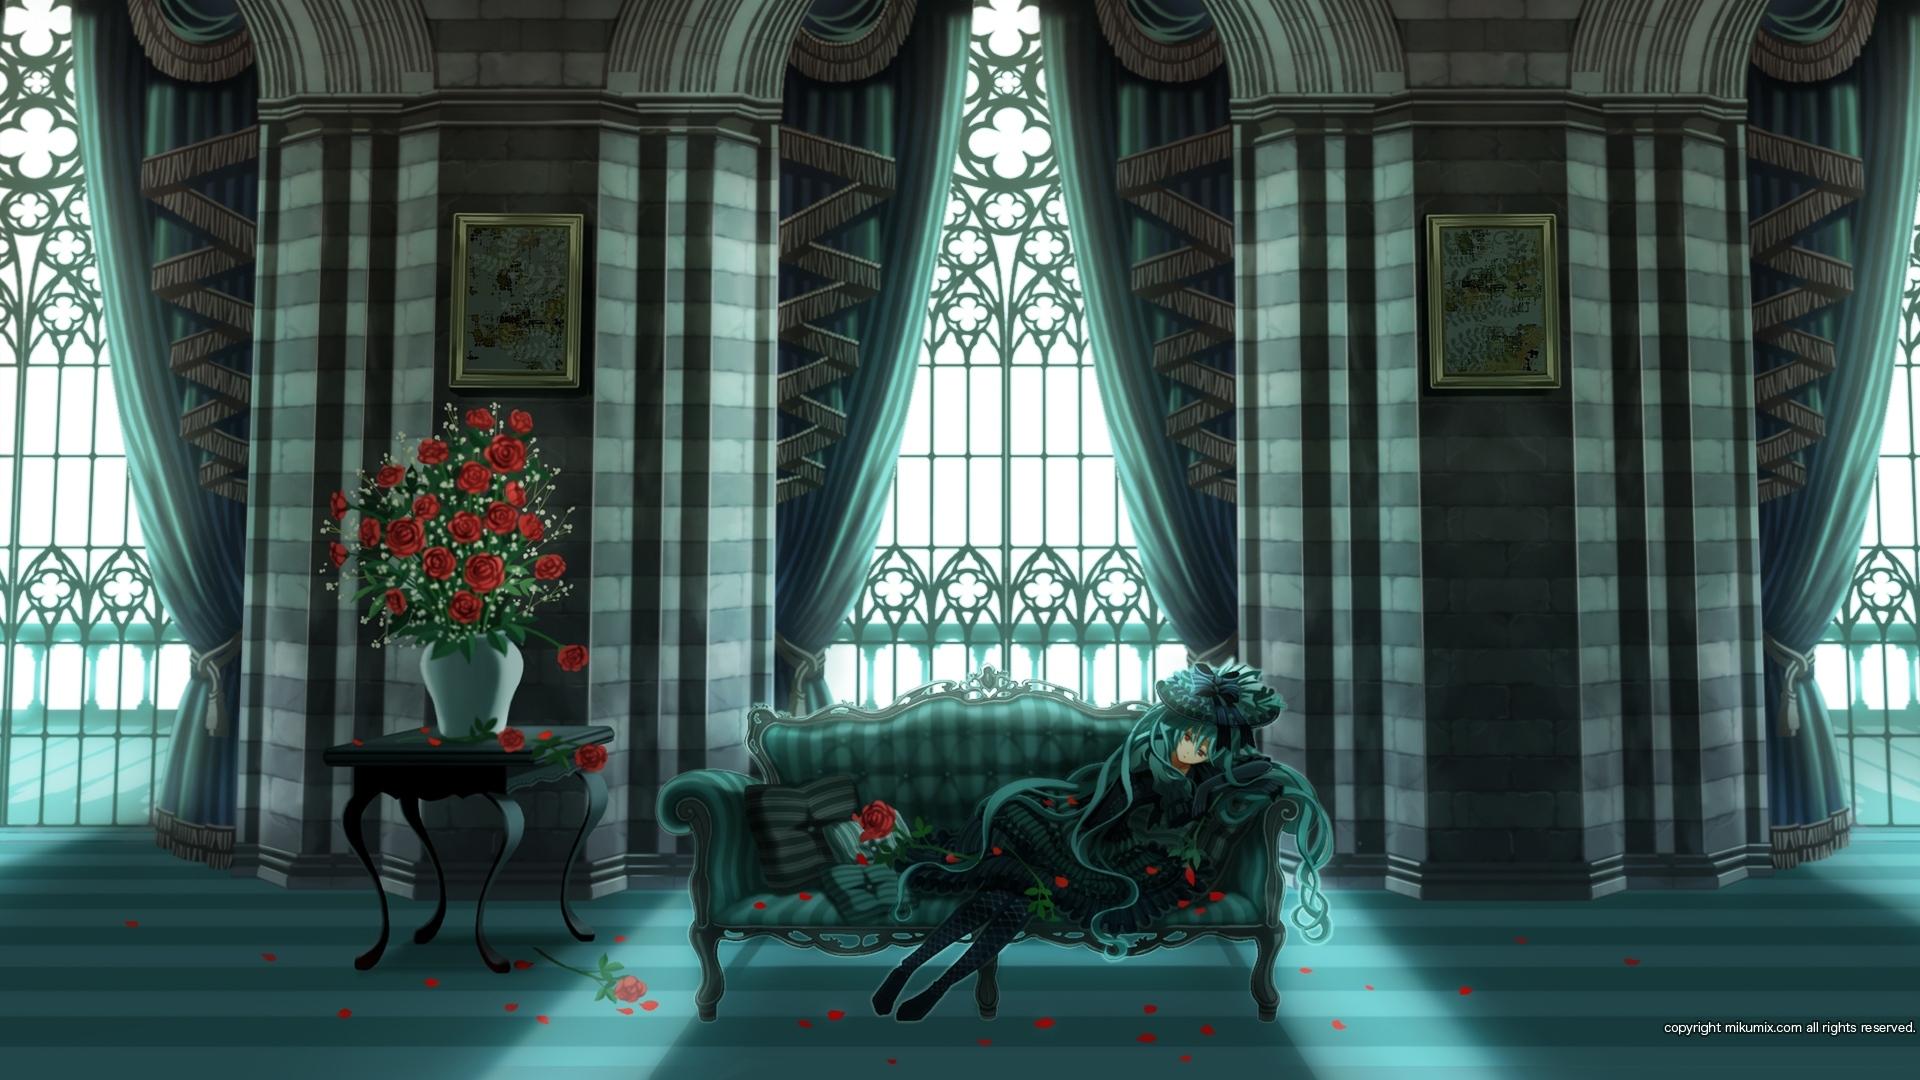 1920x1080-hatsune-miku-dress-flowers-vase-room-wallpaper-wp340942